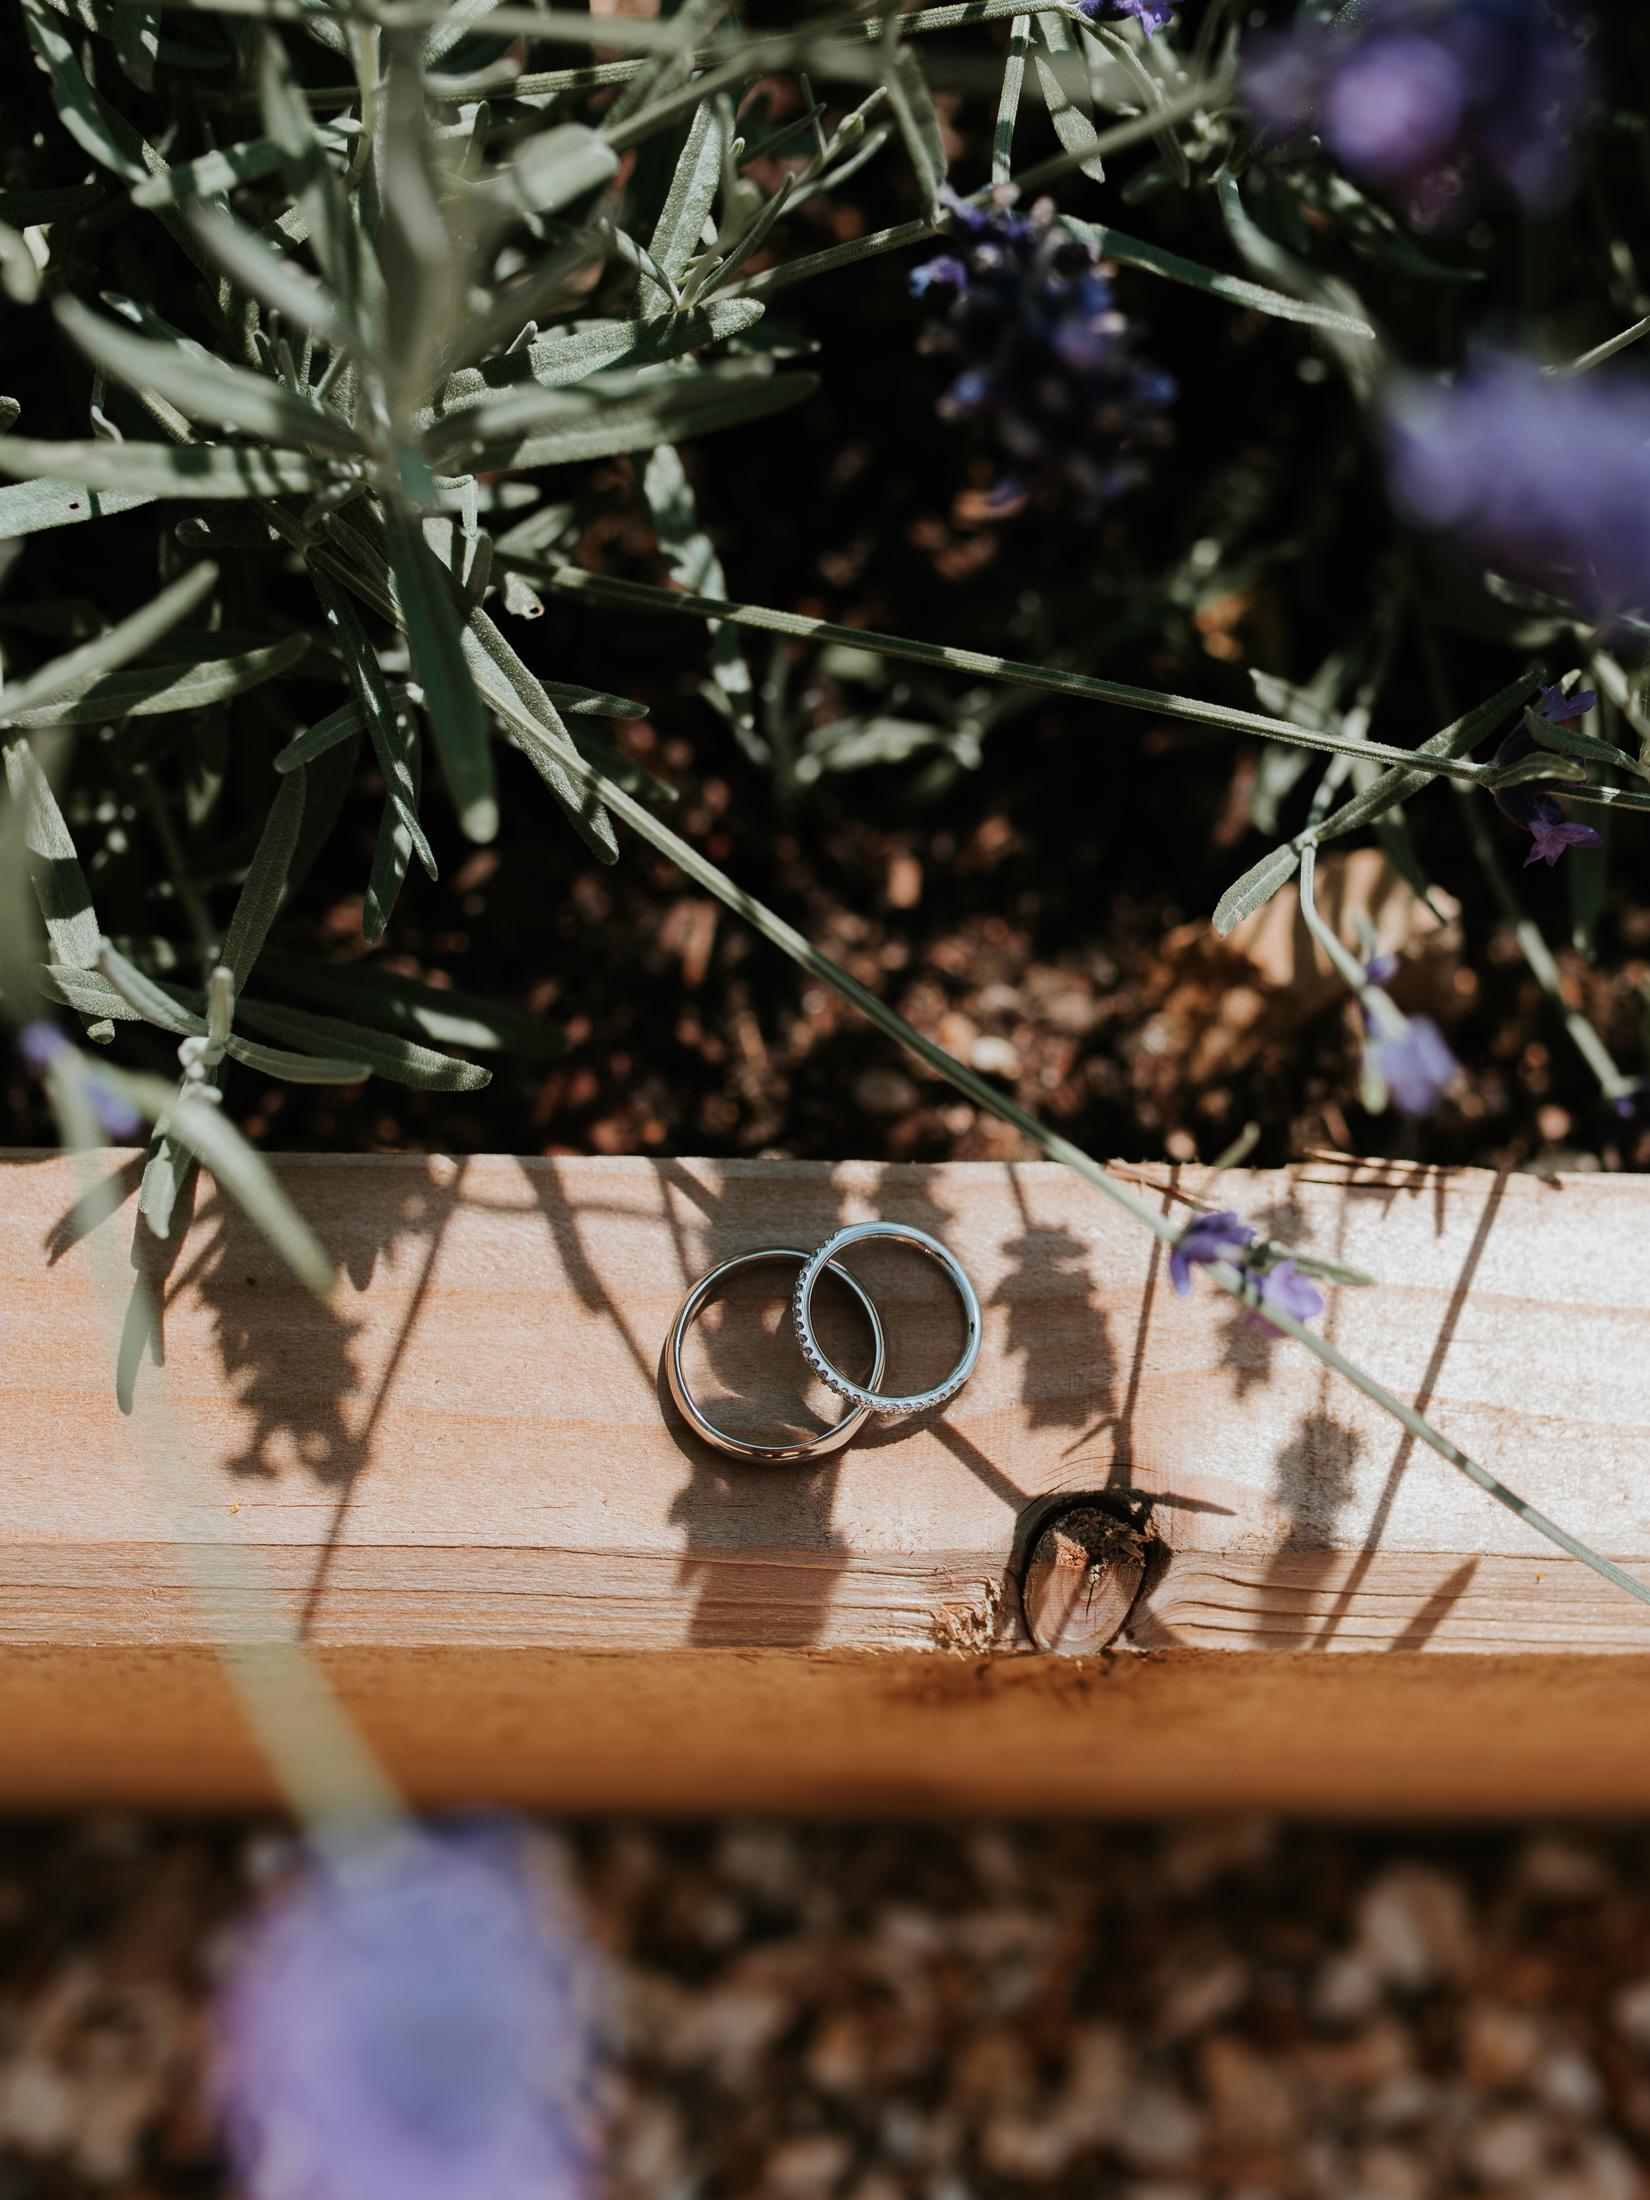 Oxfordshire-wedding-photographer-19.jpg